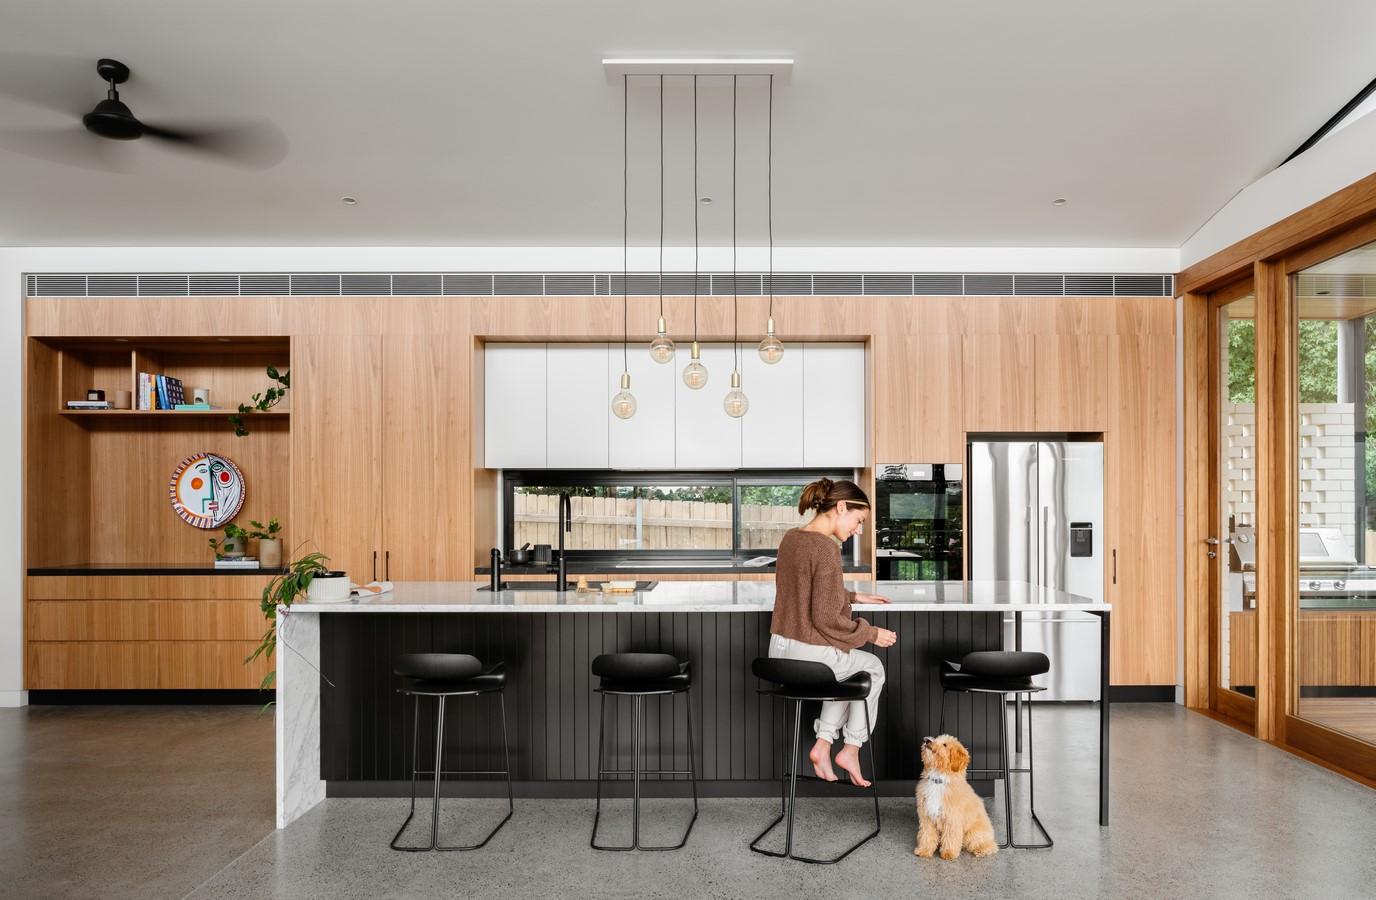 5071 Longueville House by Vanessa Wegner Architect : Sheet 1